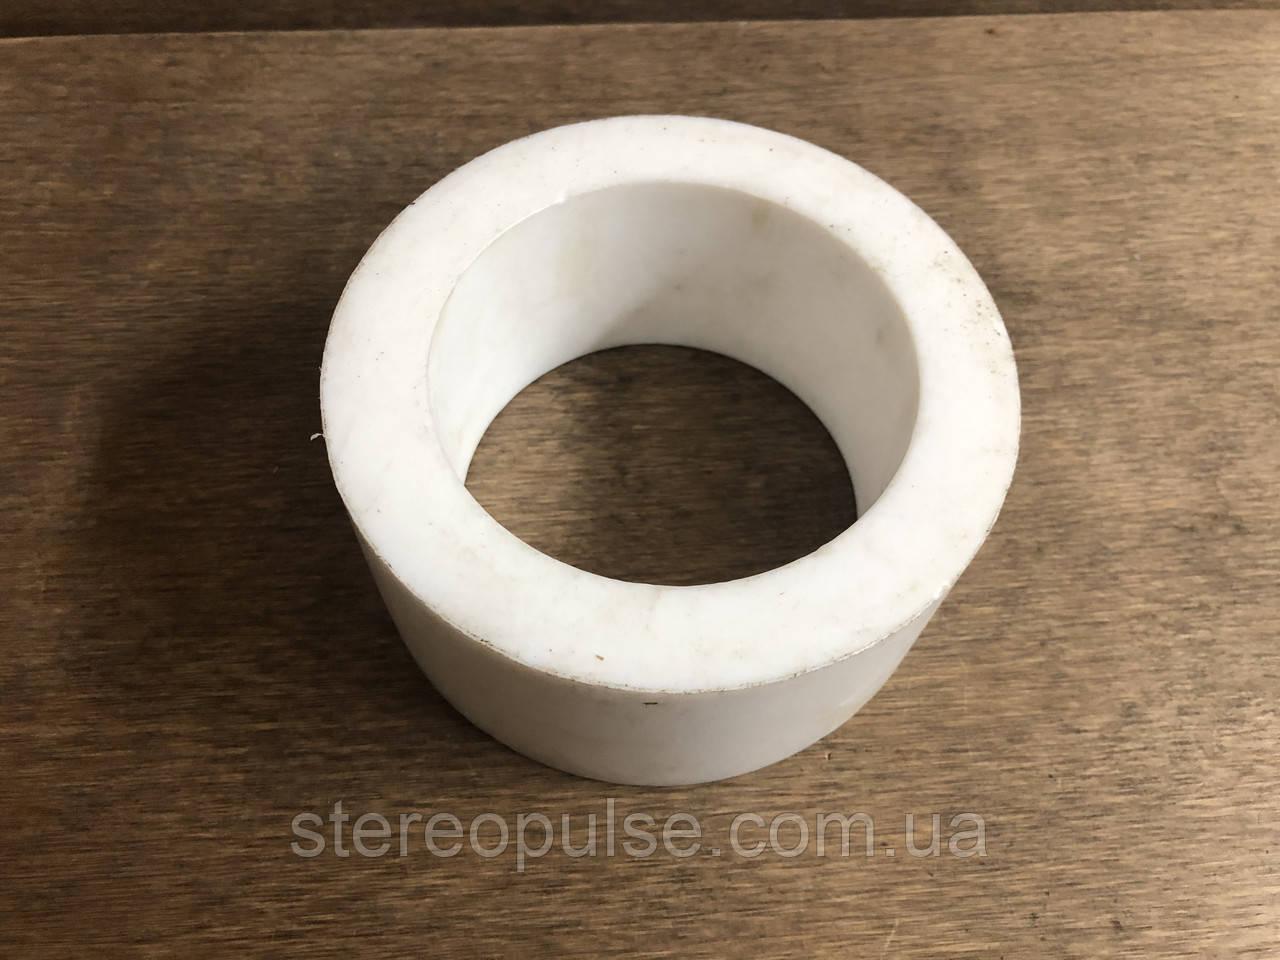 Кольцо фторопласт